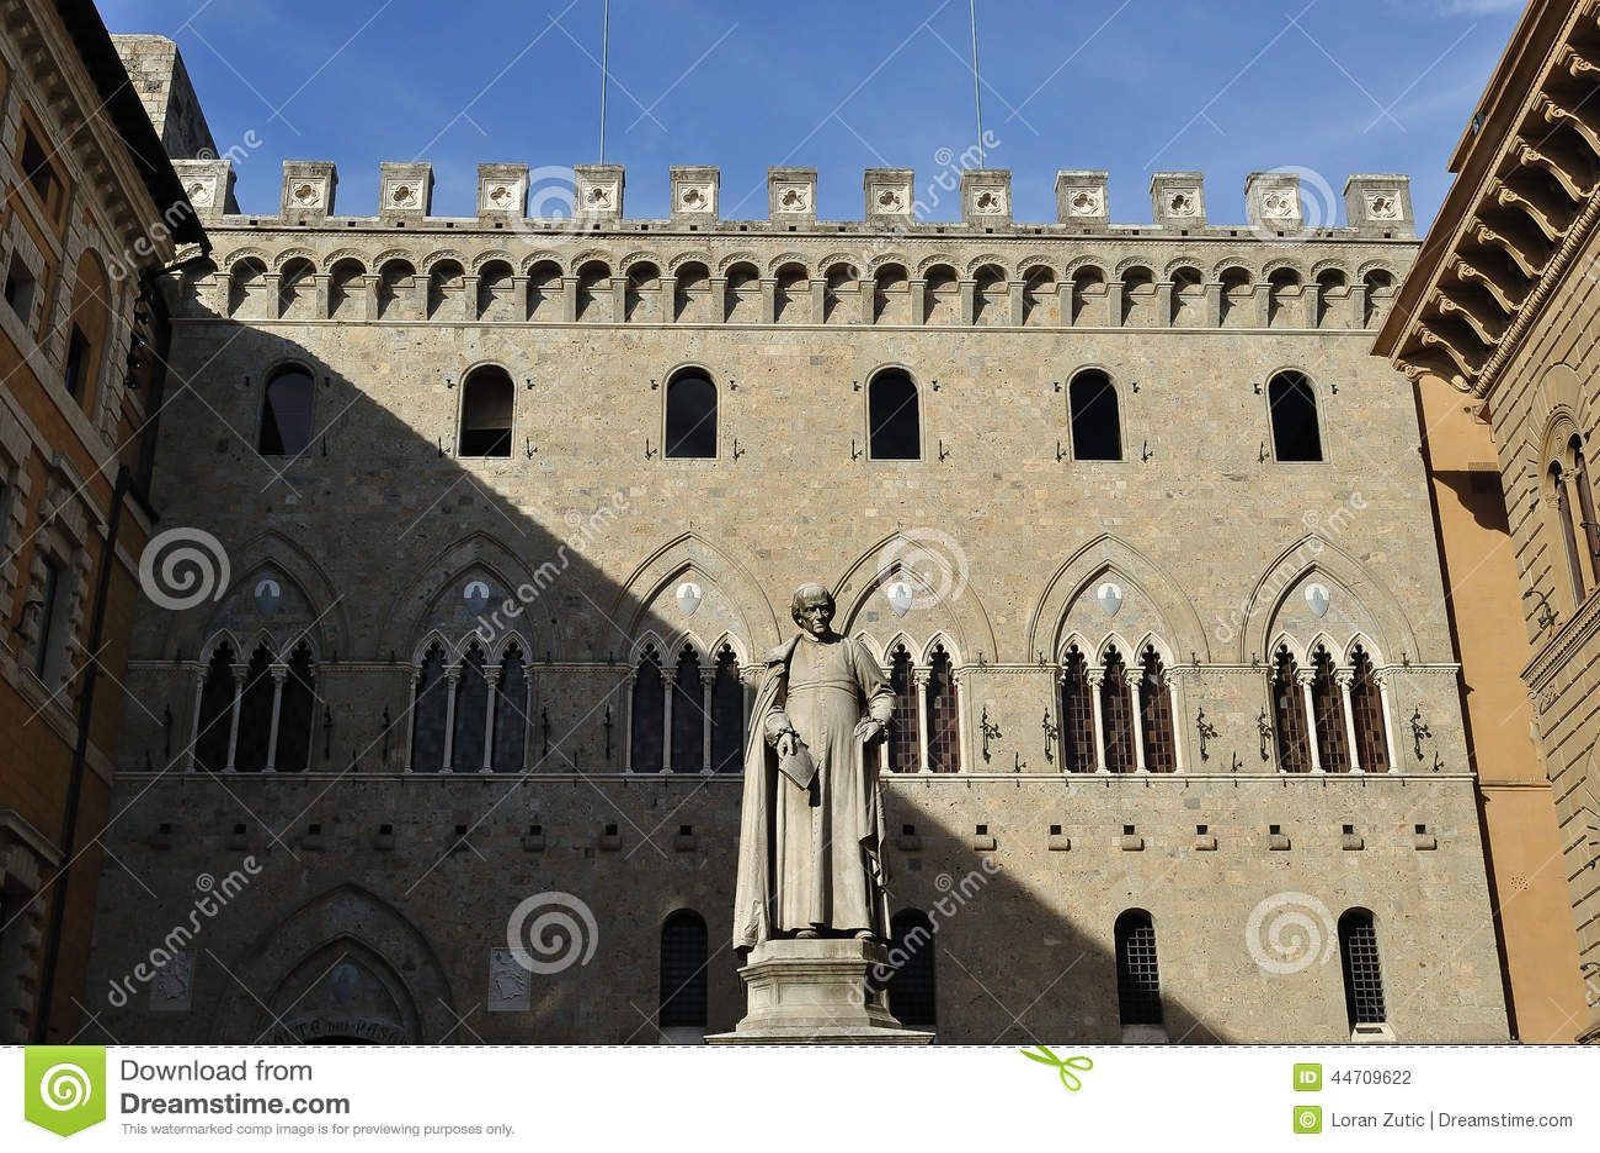 Building in Siena, Italy Images building in Siena